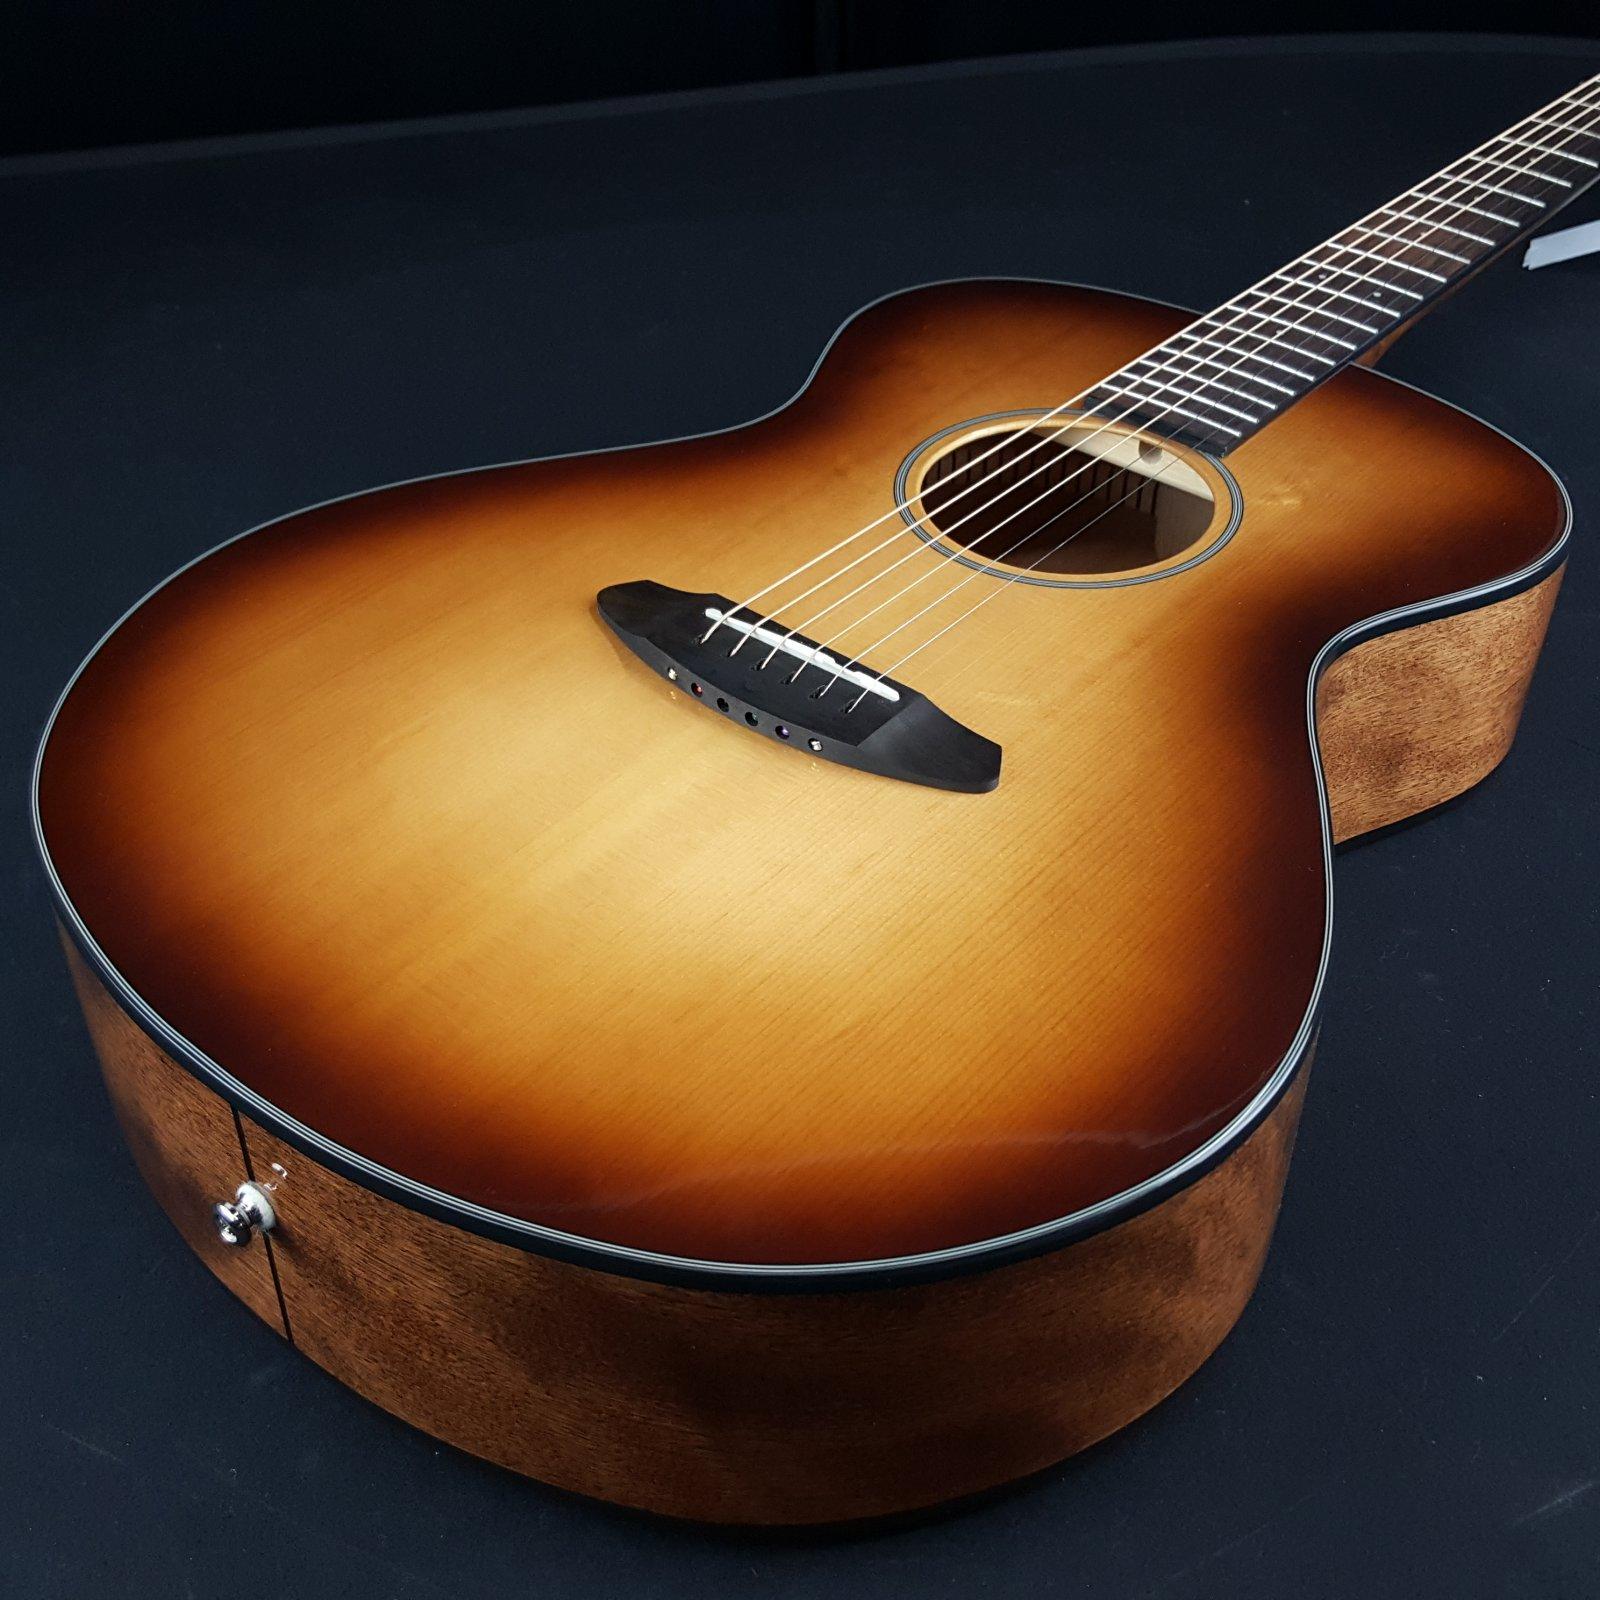 Breedlove Discovery Concert Acoustic Guitar Sunburst